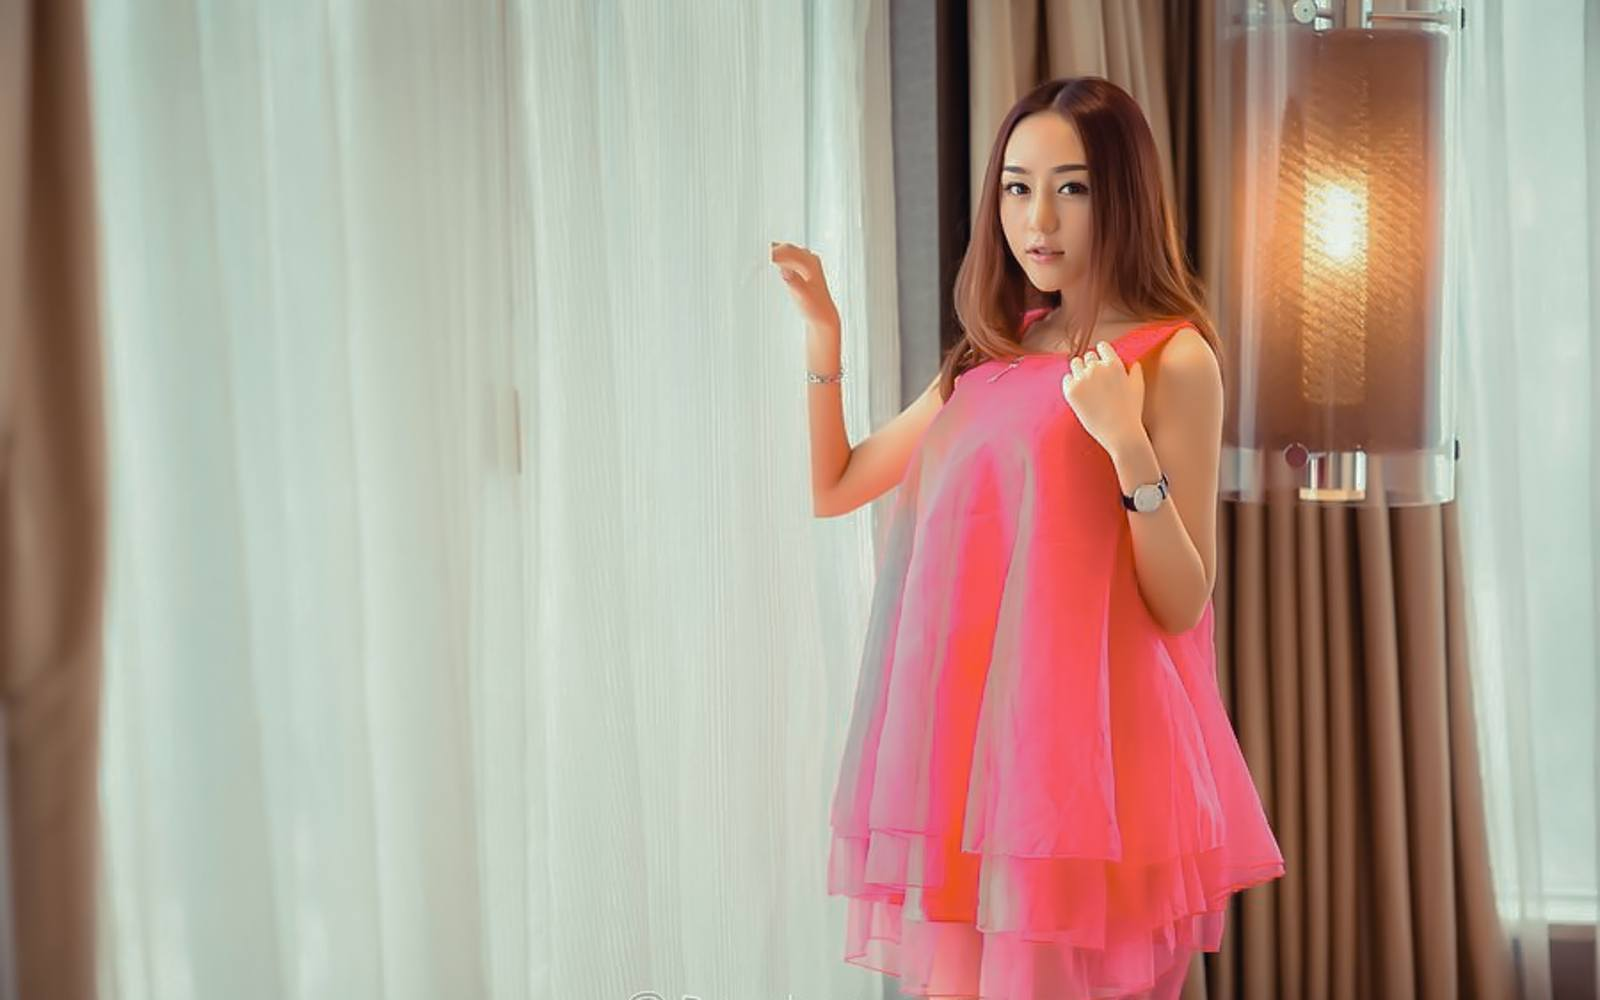 Mi%2BYeon%2BLee%2B%25E6%259D%258E%25E7%25BE%258E%25E5%25A6%258D%2B %2BBubbles Covered%2BNude%2BOutdoors%2B %2B001 - Korean Nude - Big Albom Remain #A-korean girl